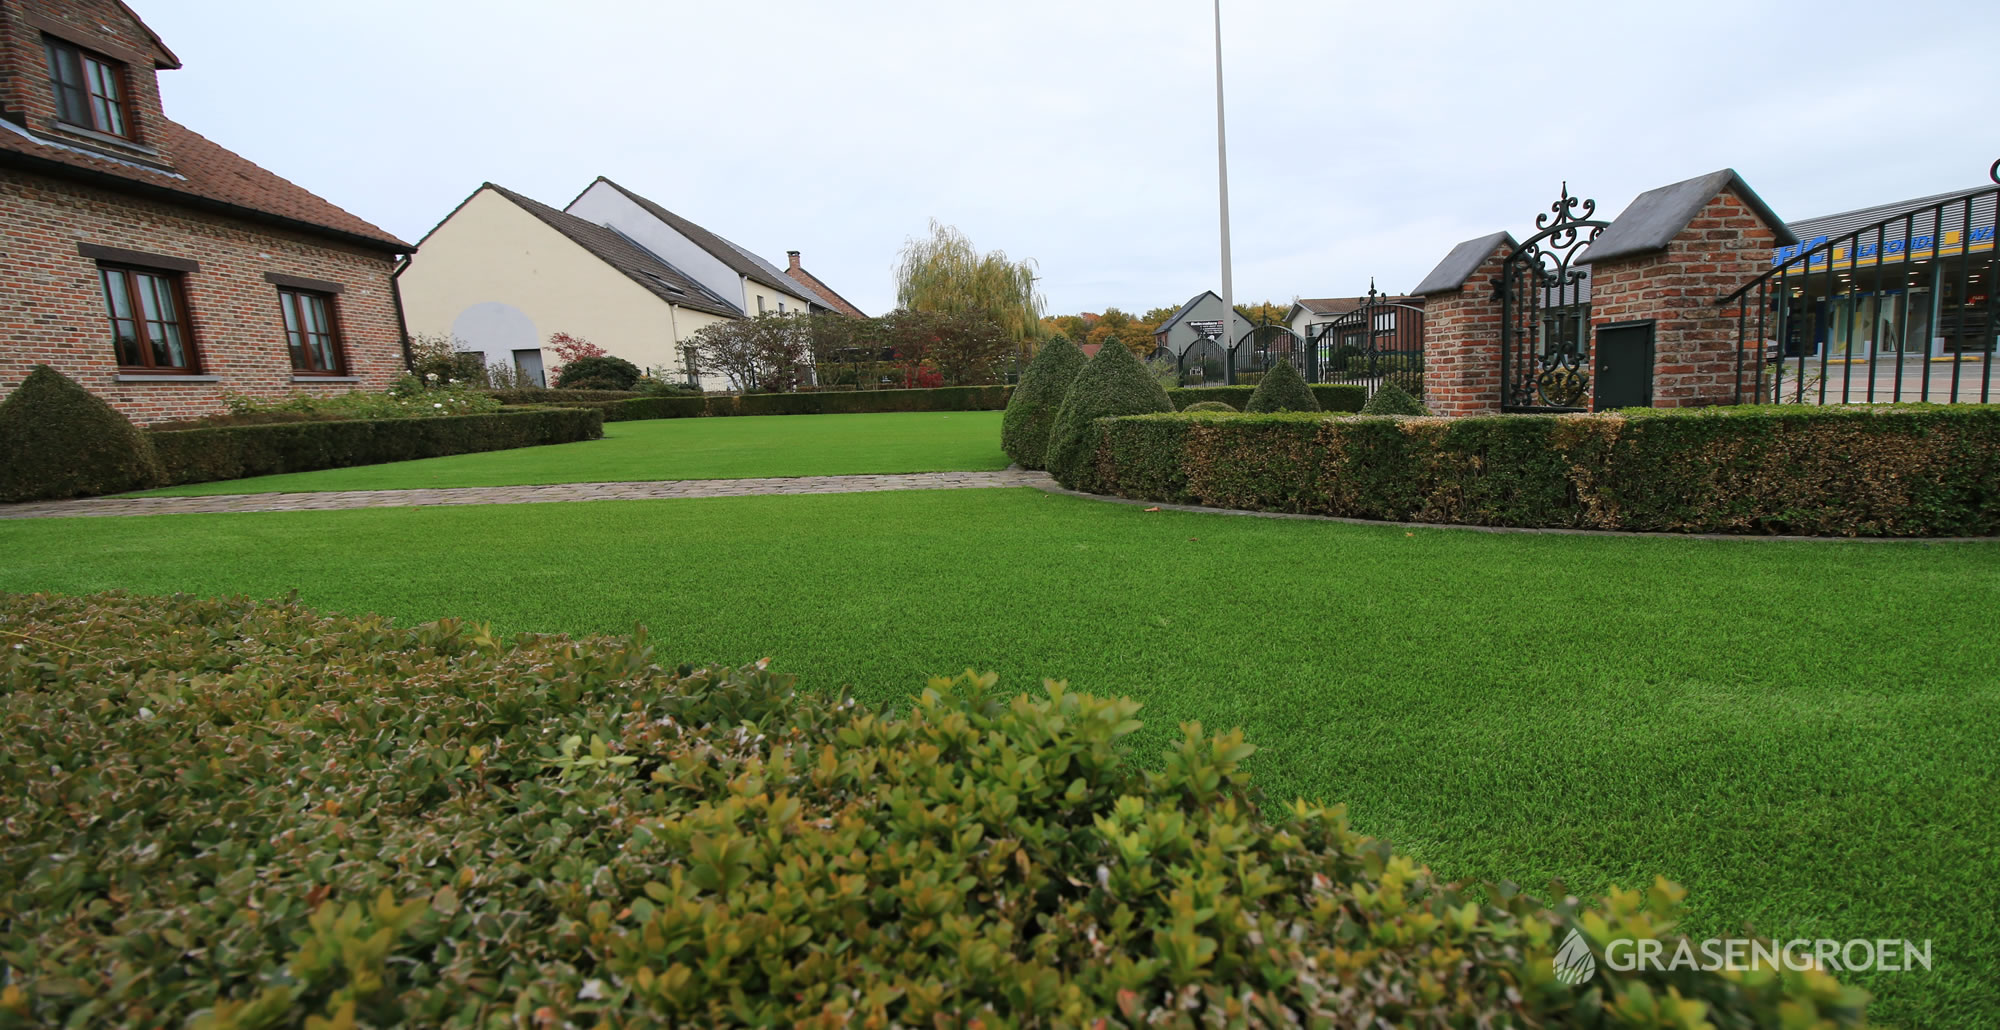 Kunstgrasleggenkermt18 • Gras en Groen Kunstgras